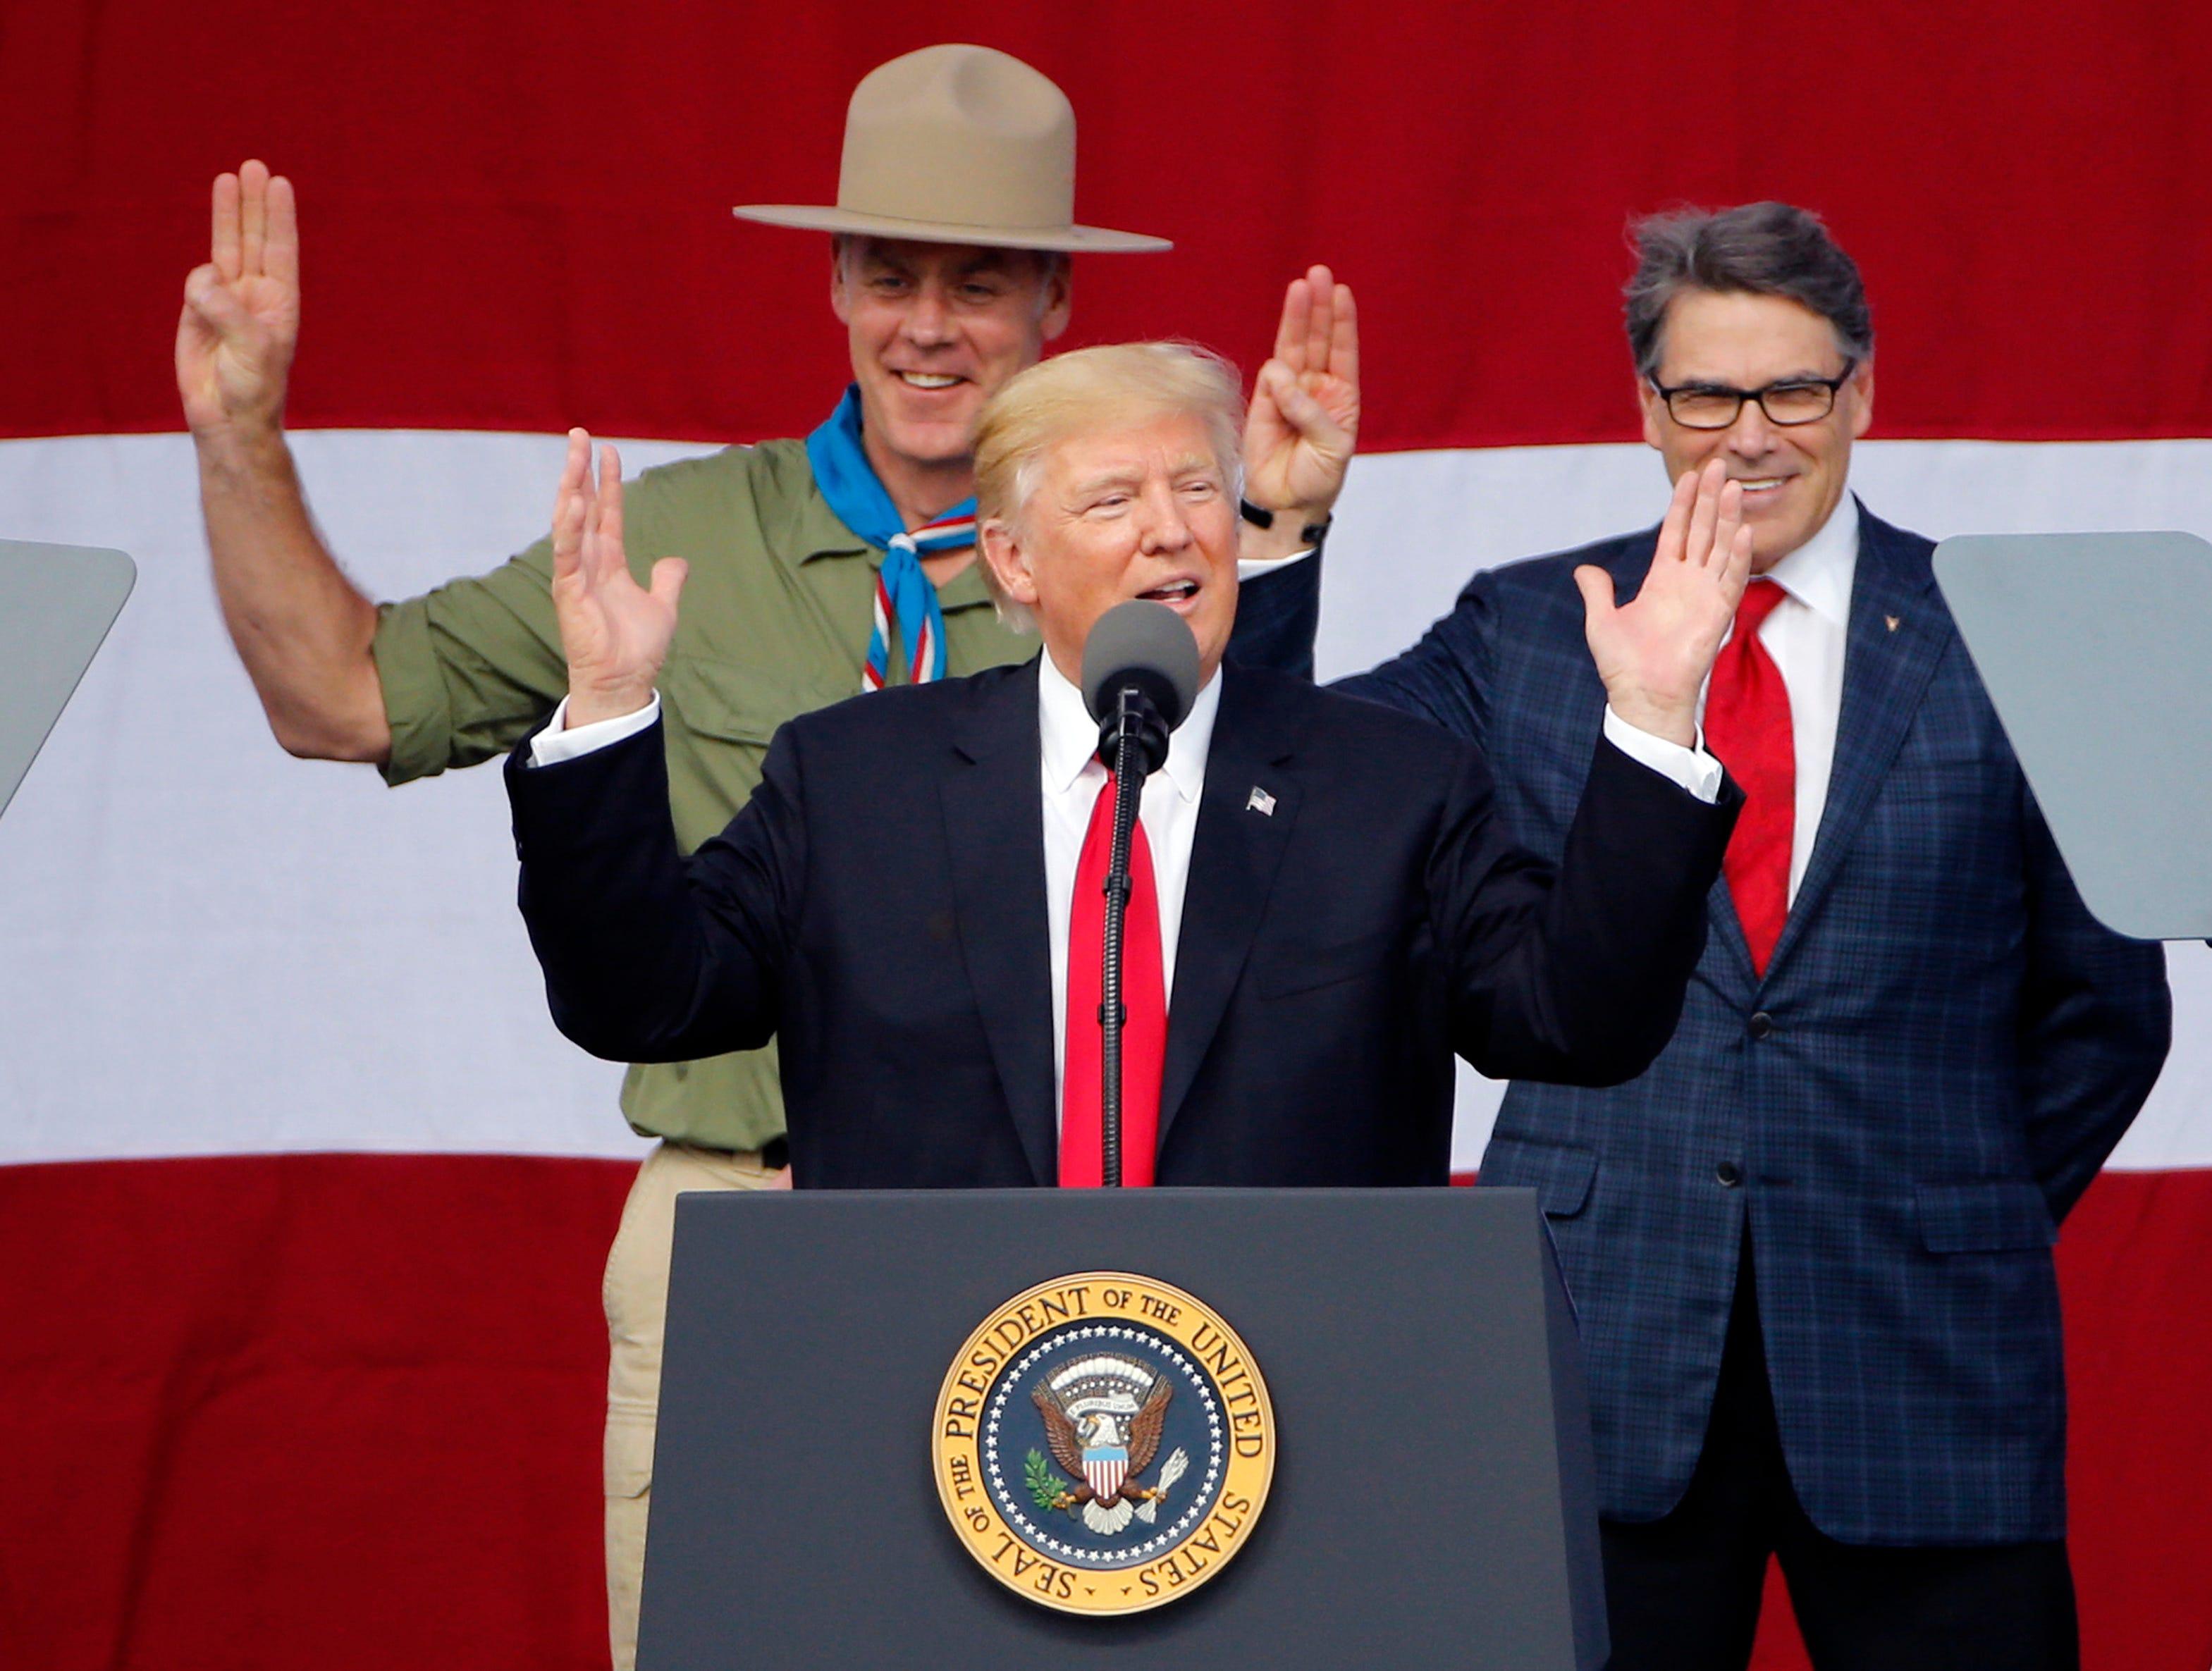 Boy Scouts chief after Trump speech We regret that politics